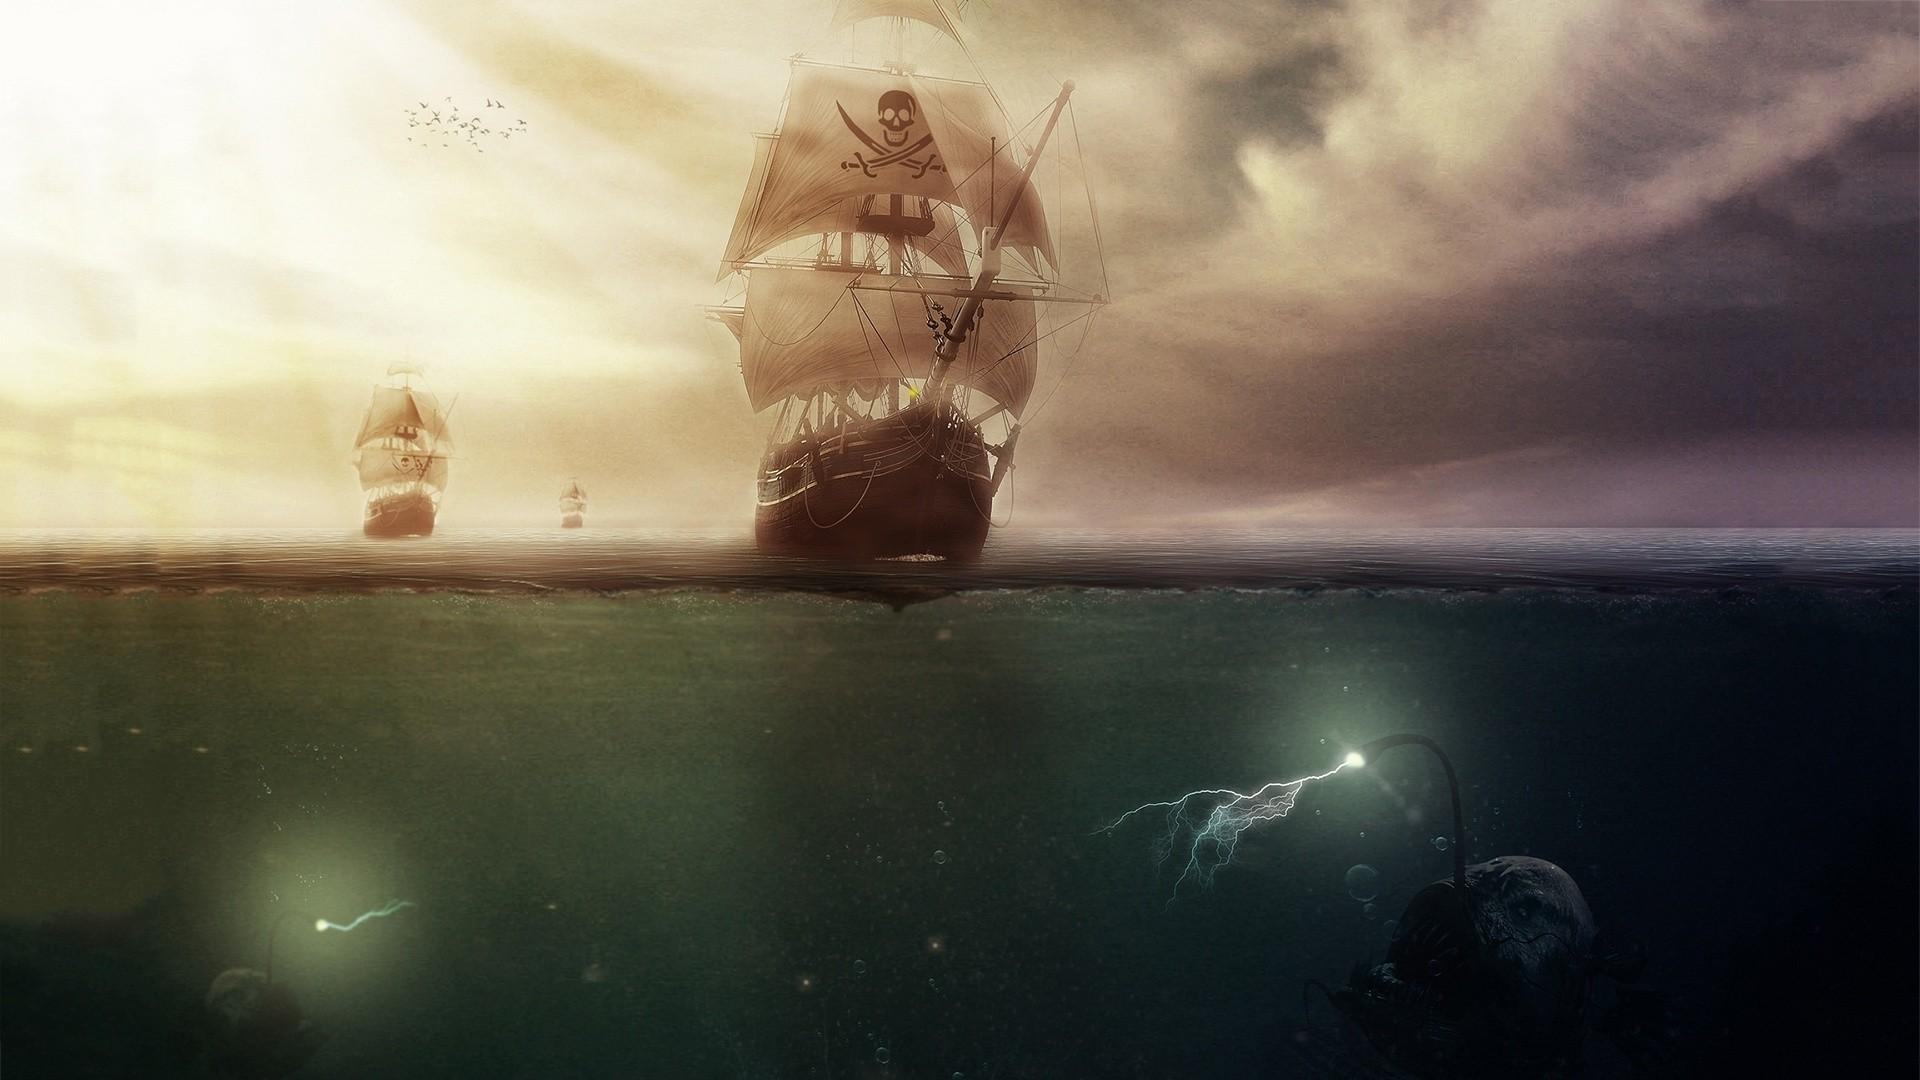 Pirates Artwork Sailing Ship Sea Clouds Anglerfish